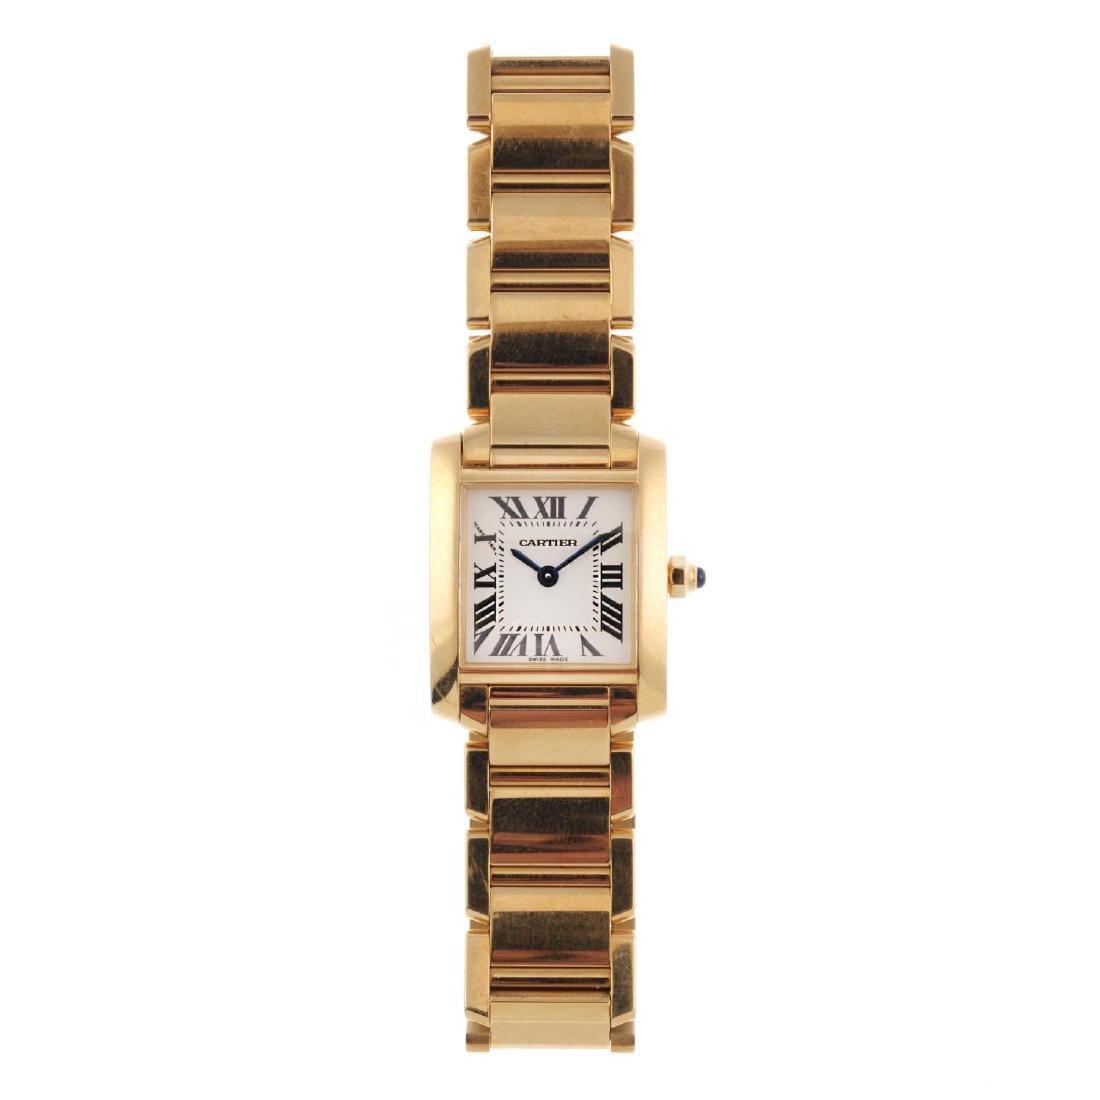 CARTIER - a Tank Francaise bracelet watch. 18ct yellow